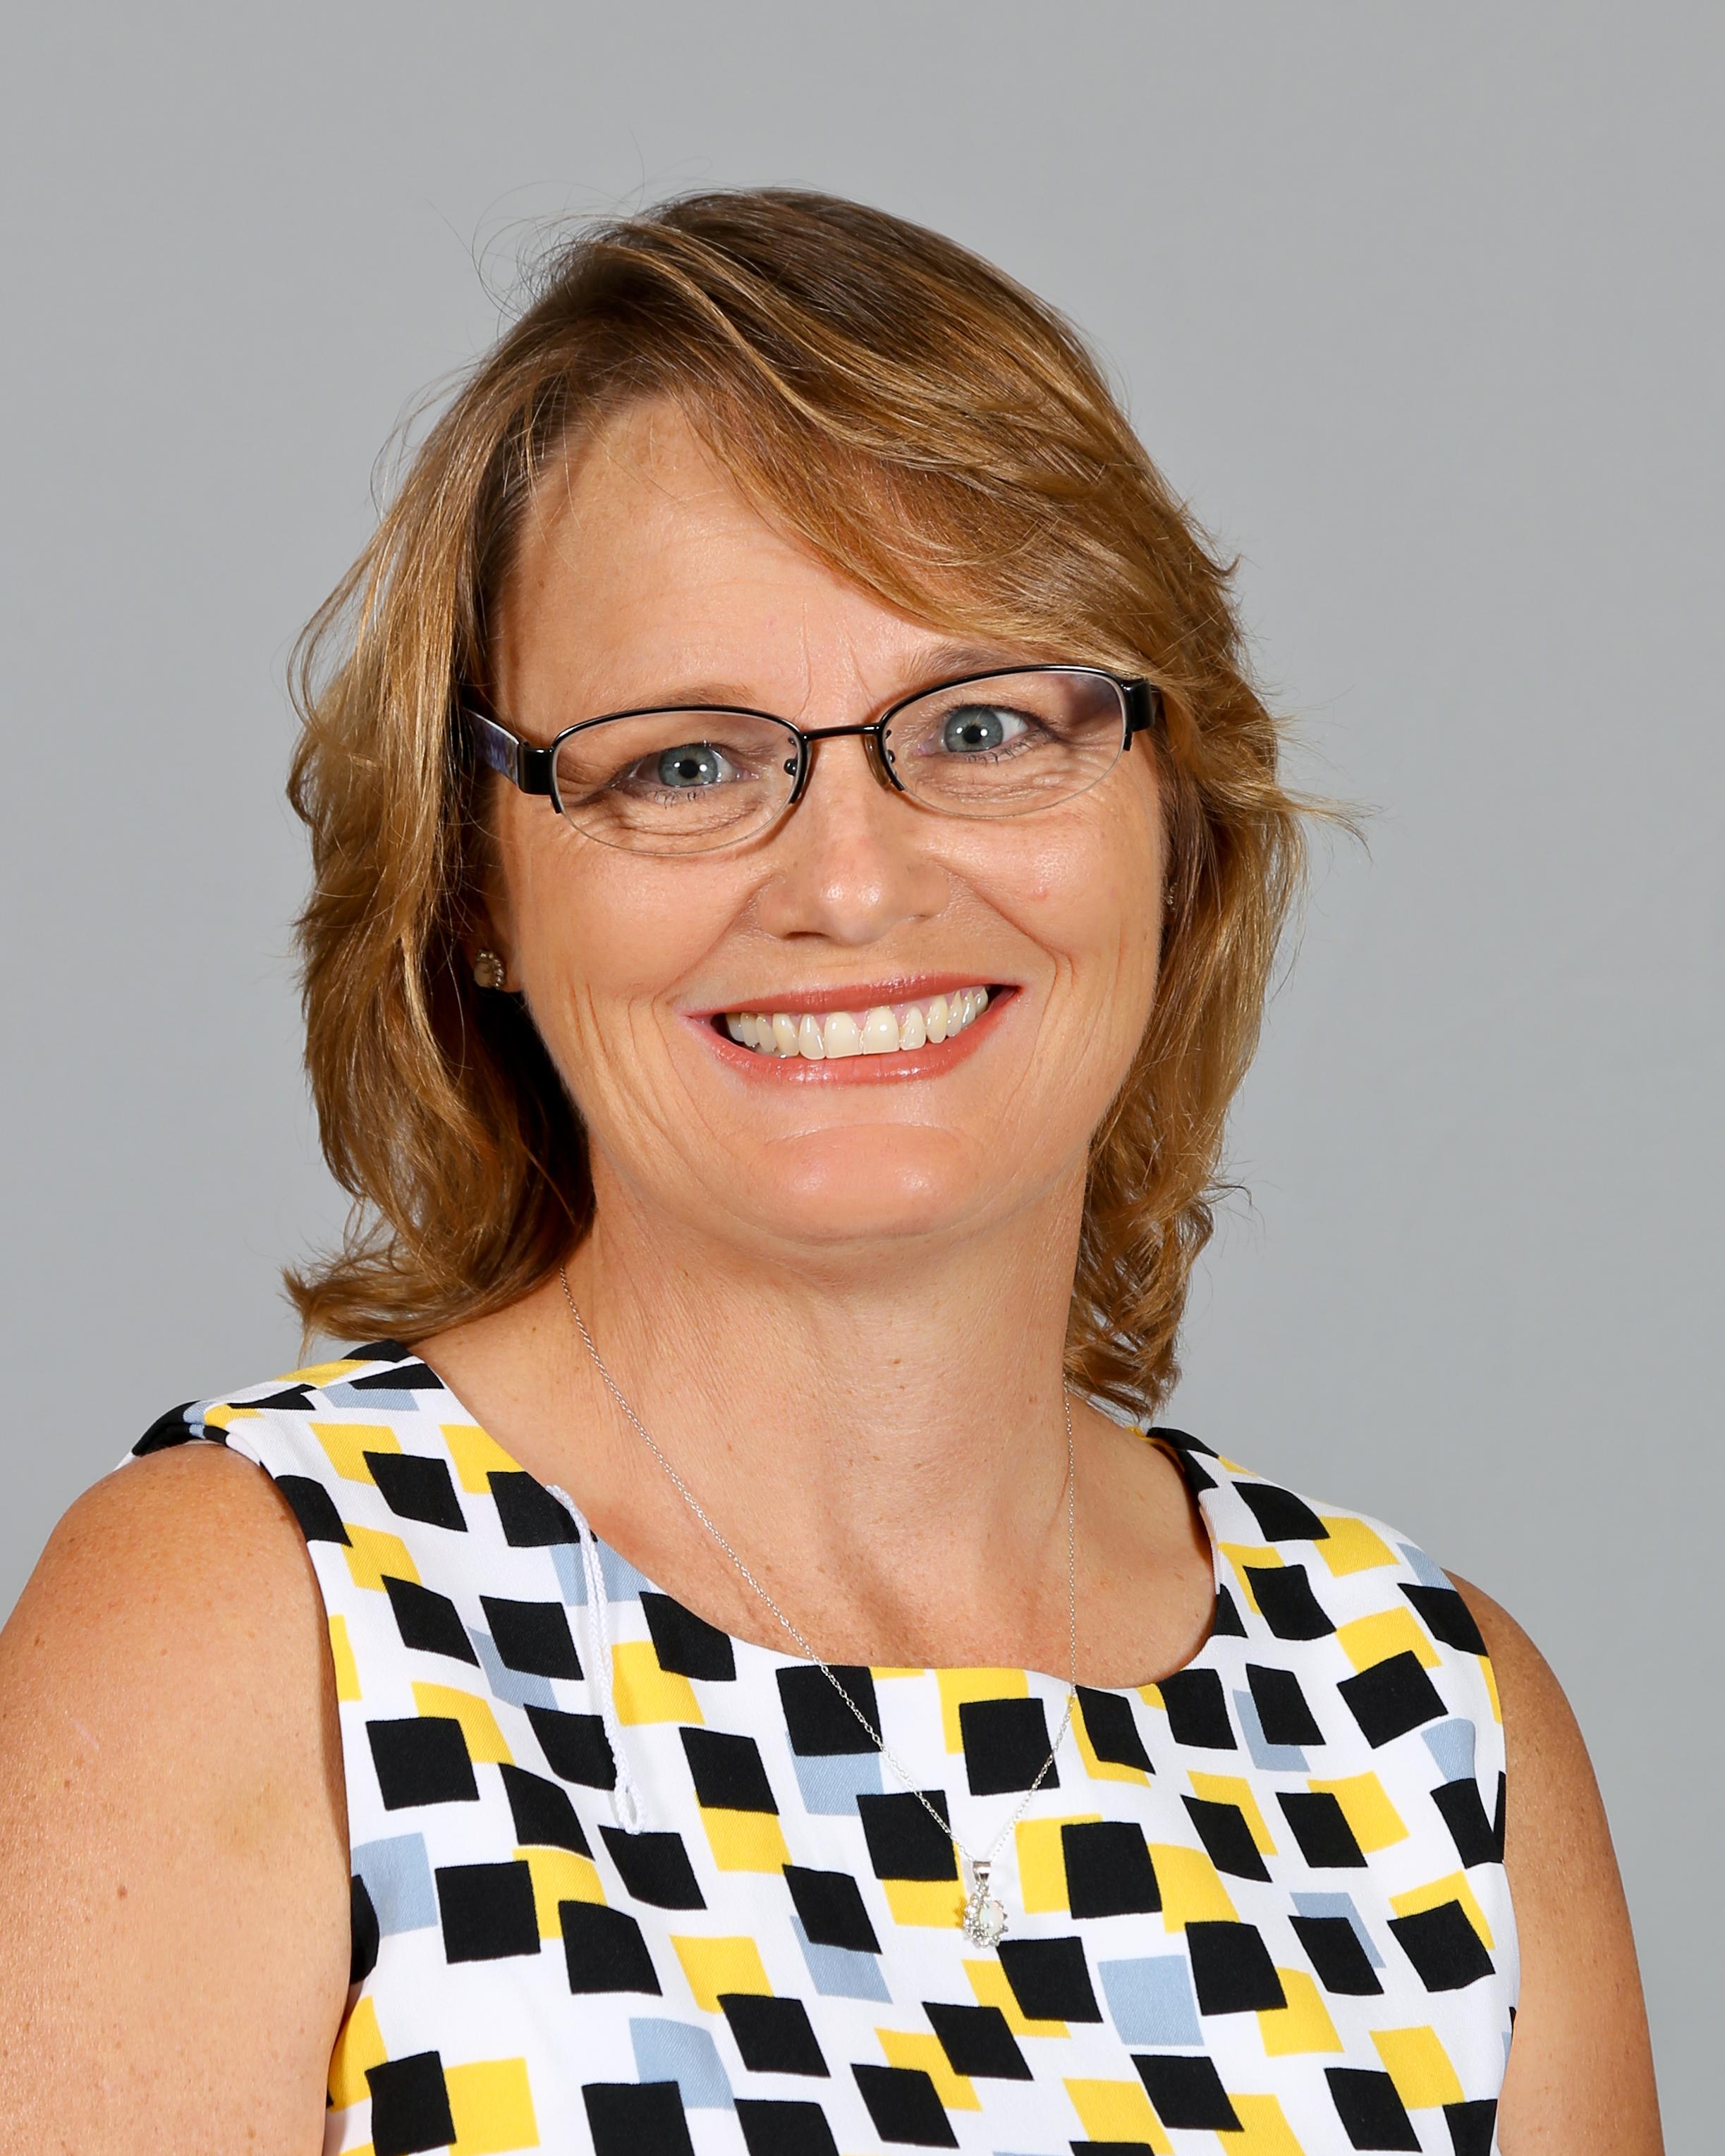 Elizabeth Megonigal Portrait Photo